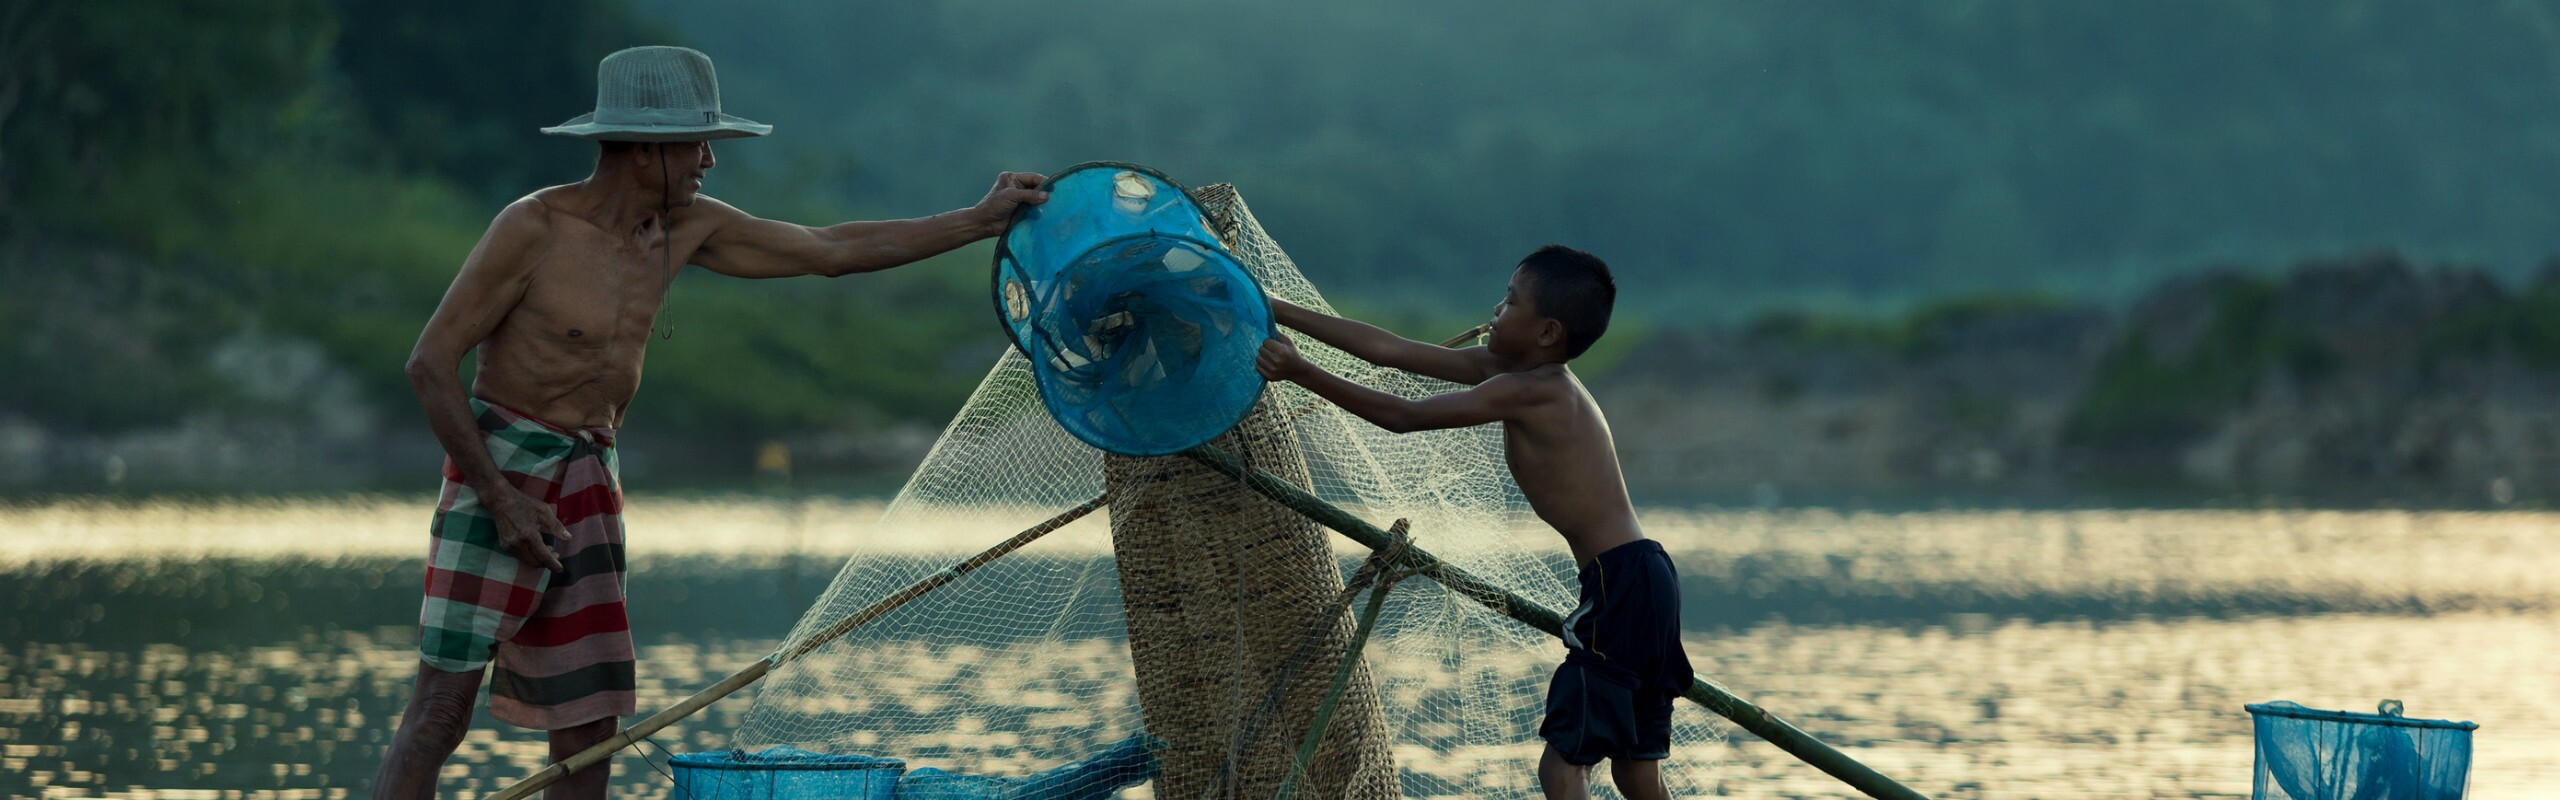 The People of Vietnam